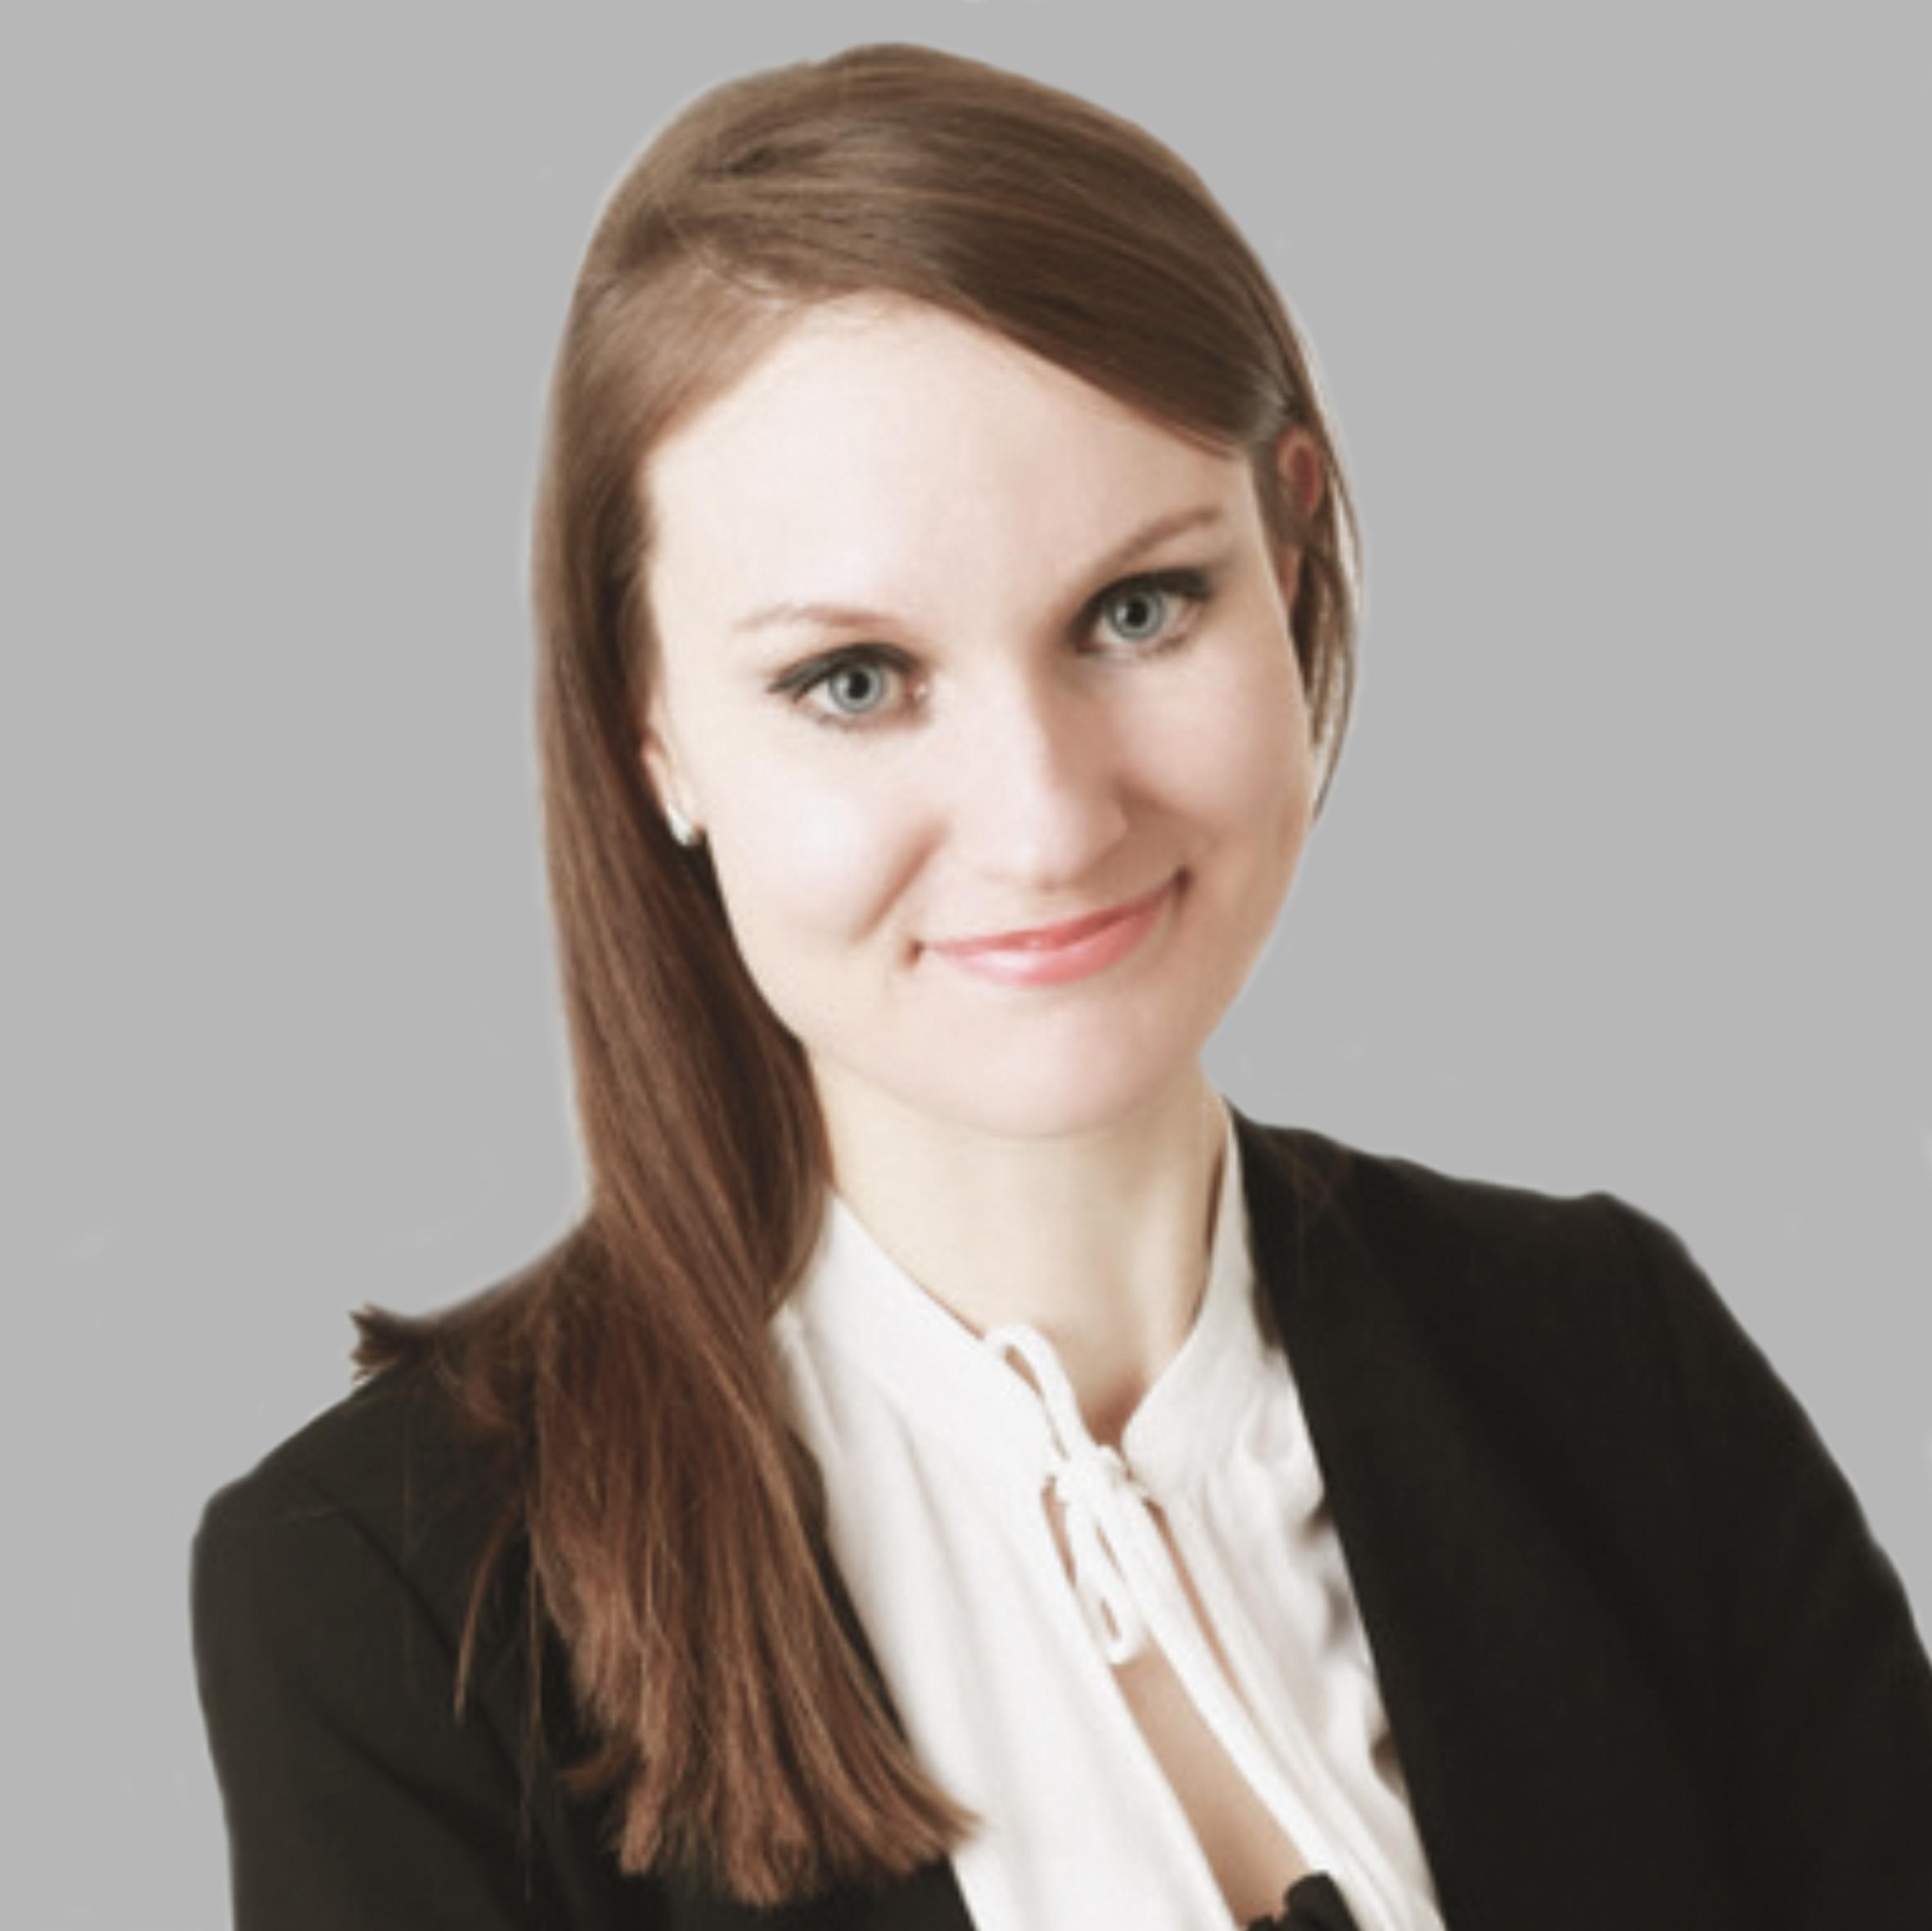 Claire Baurin, claire@compacon.fr Compacon